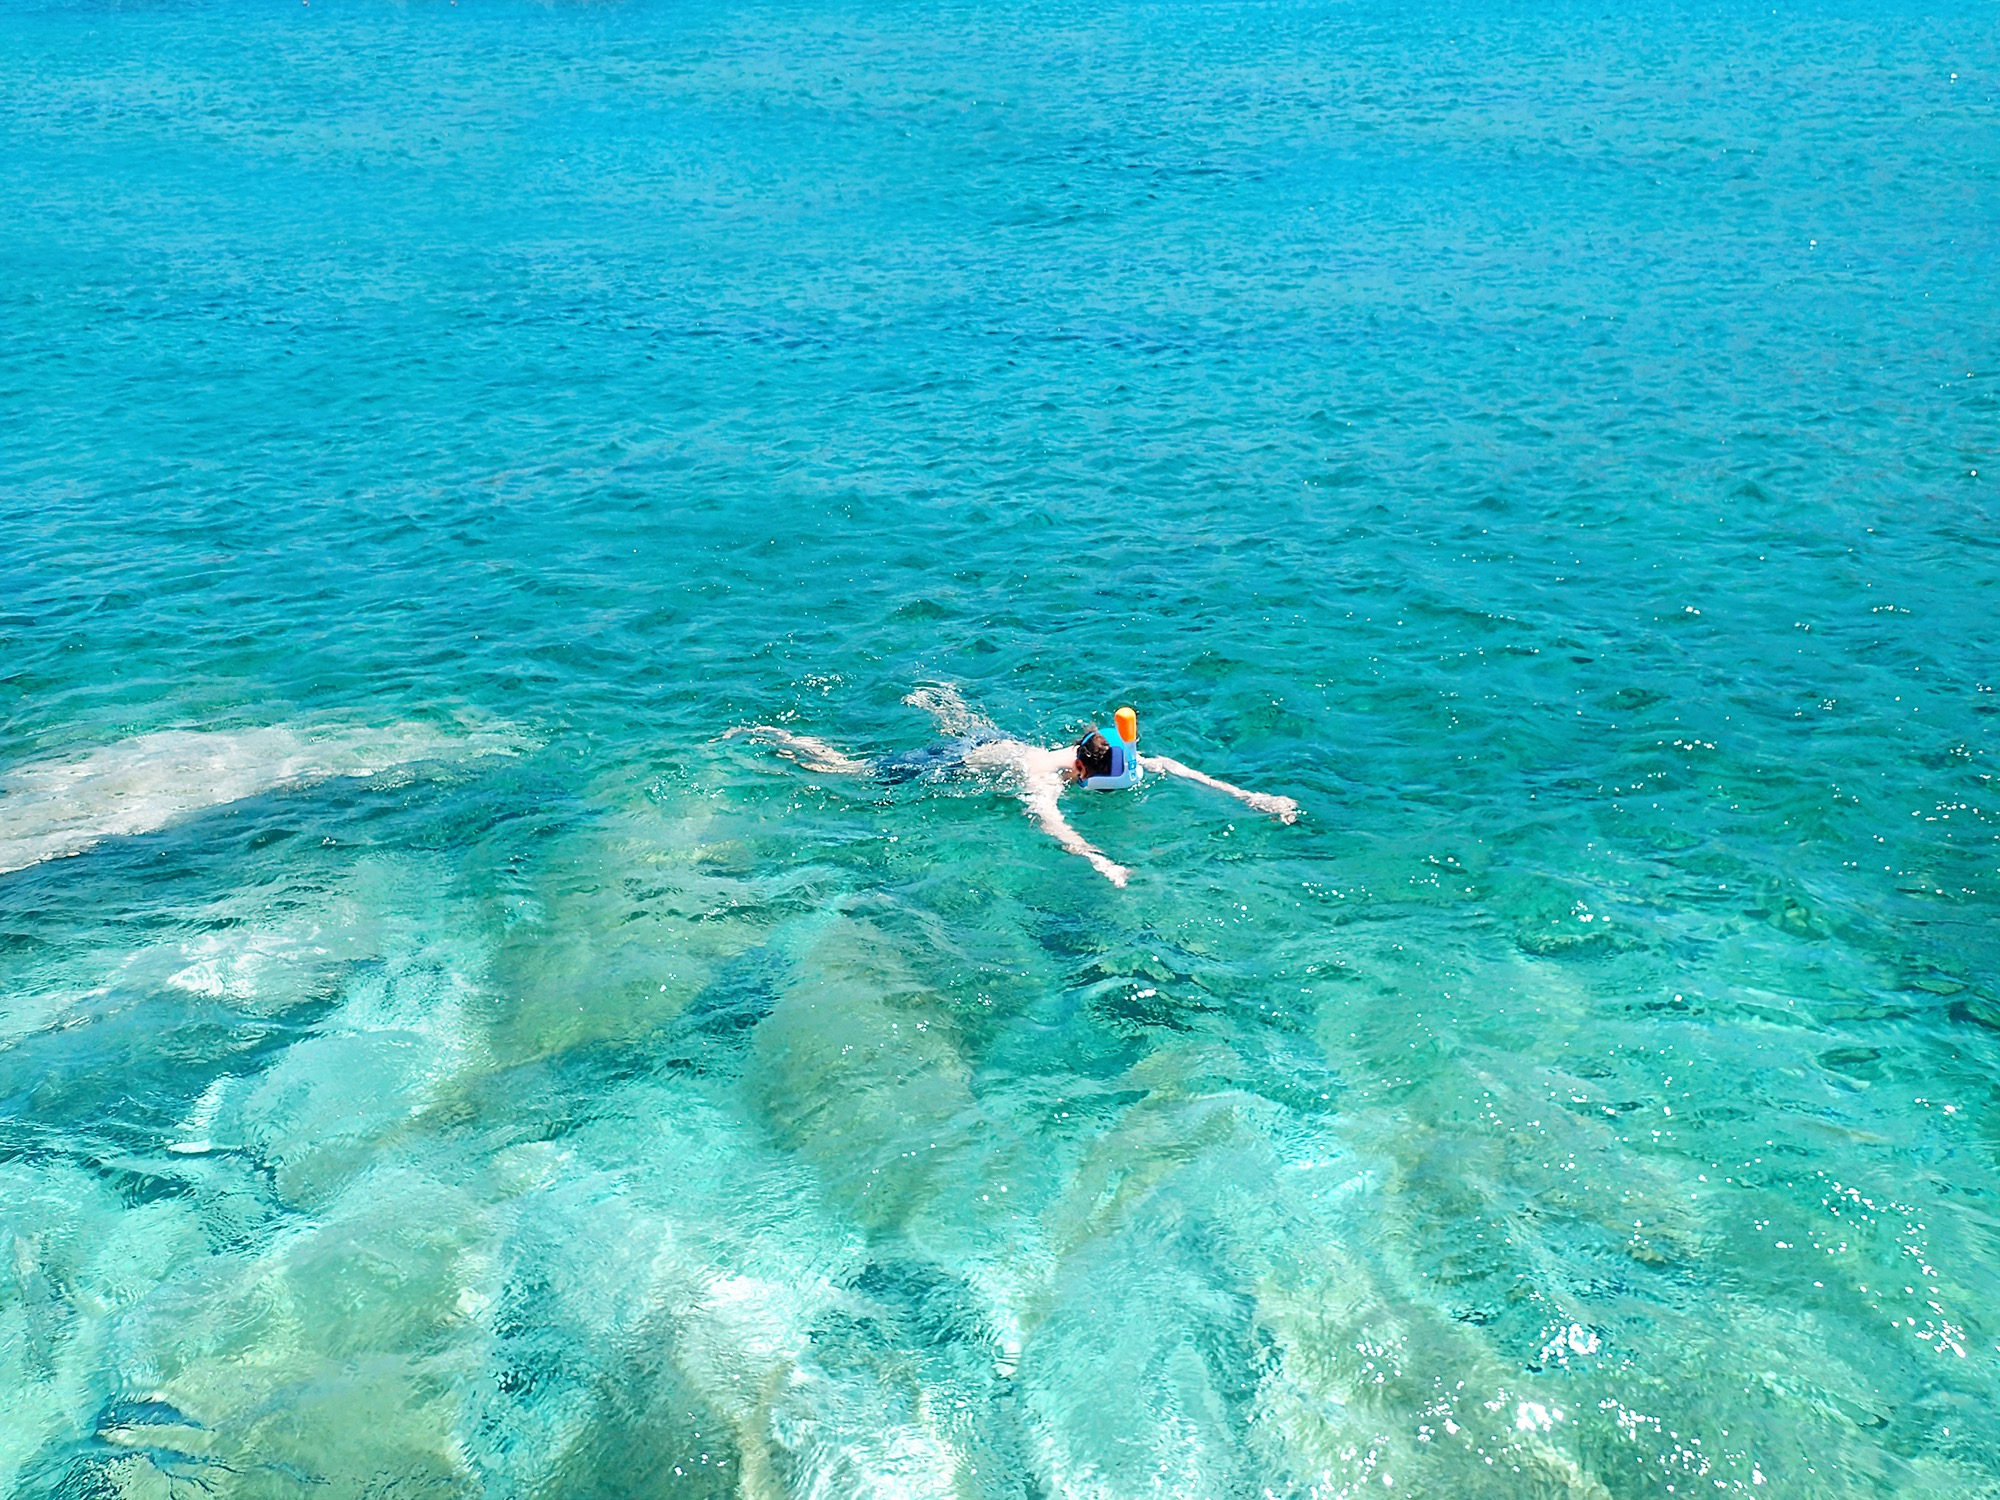 snorkeling_buvarkodas_nyaralas_greece_gorogorszag_legszebb_agia_pelagia_strand.jpg